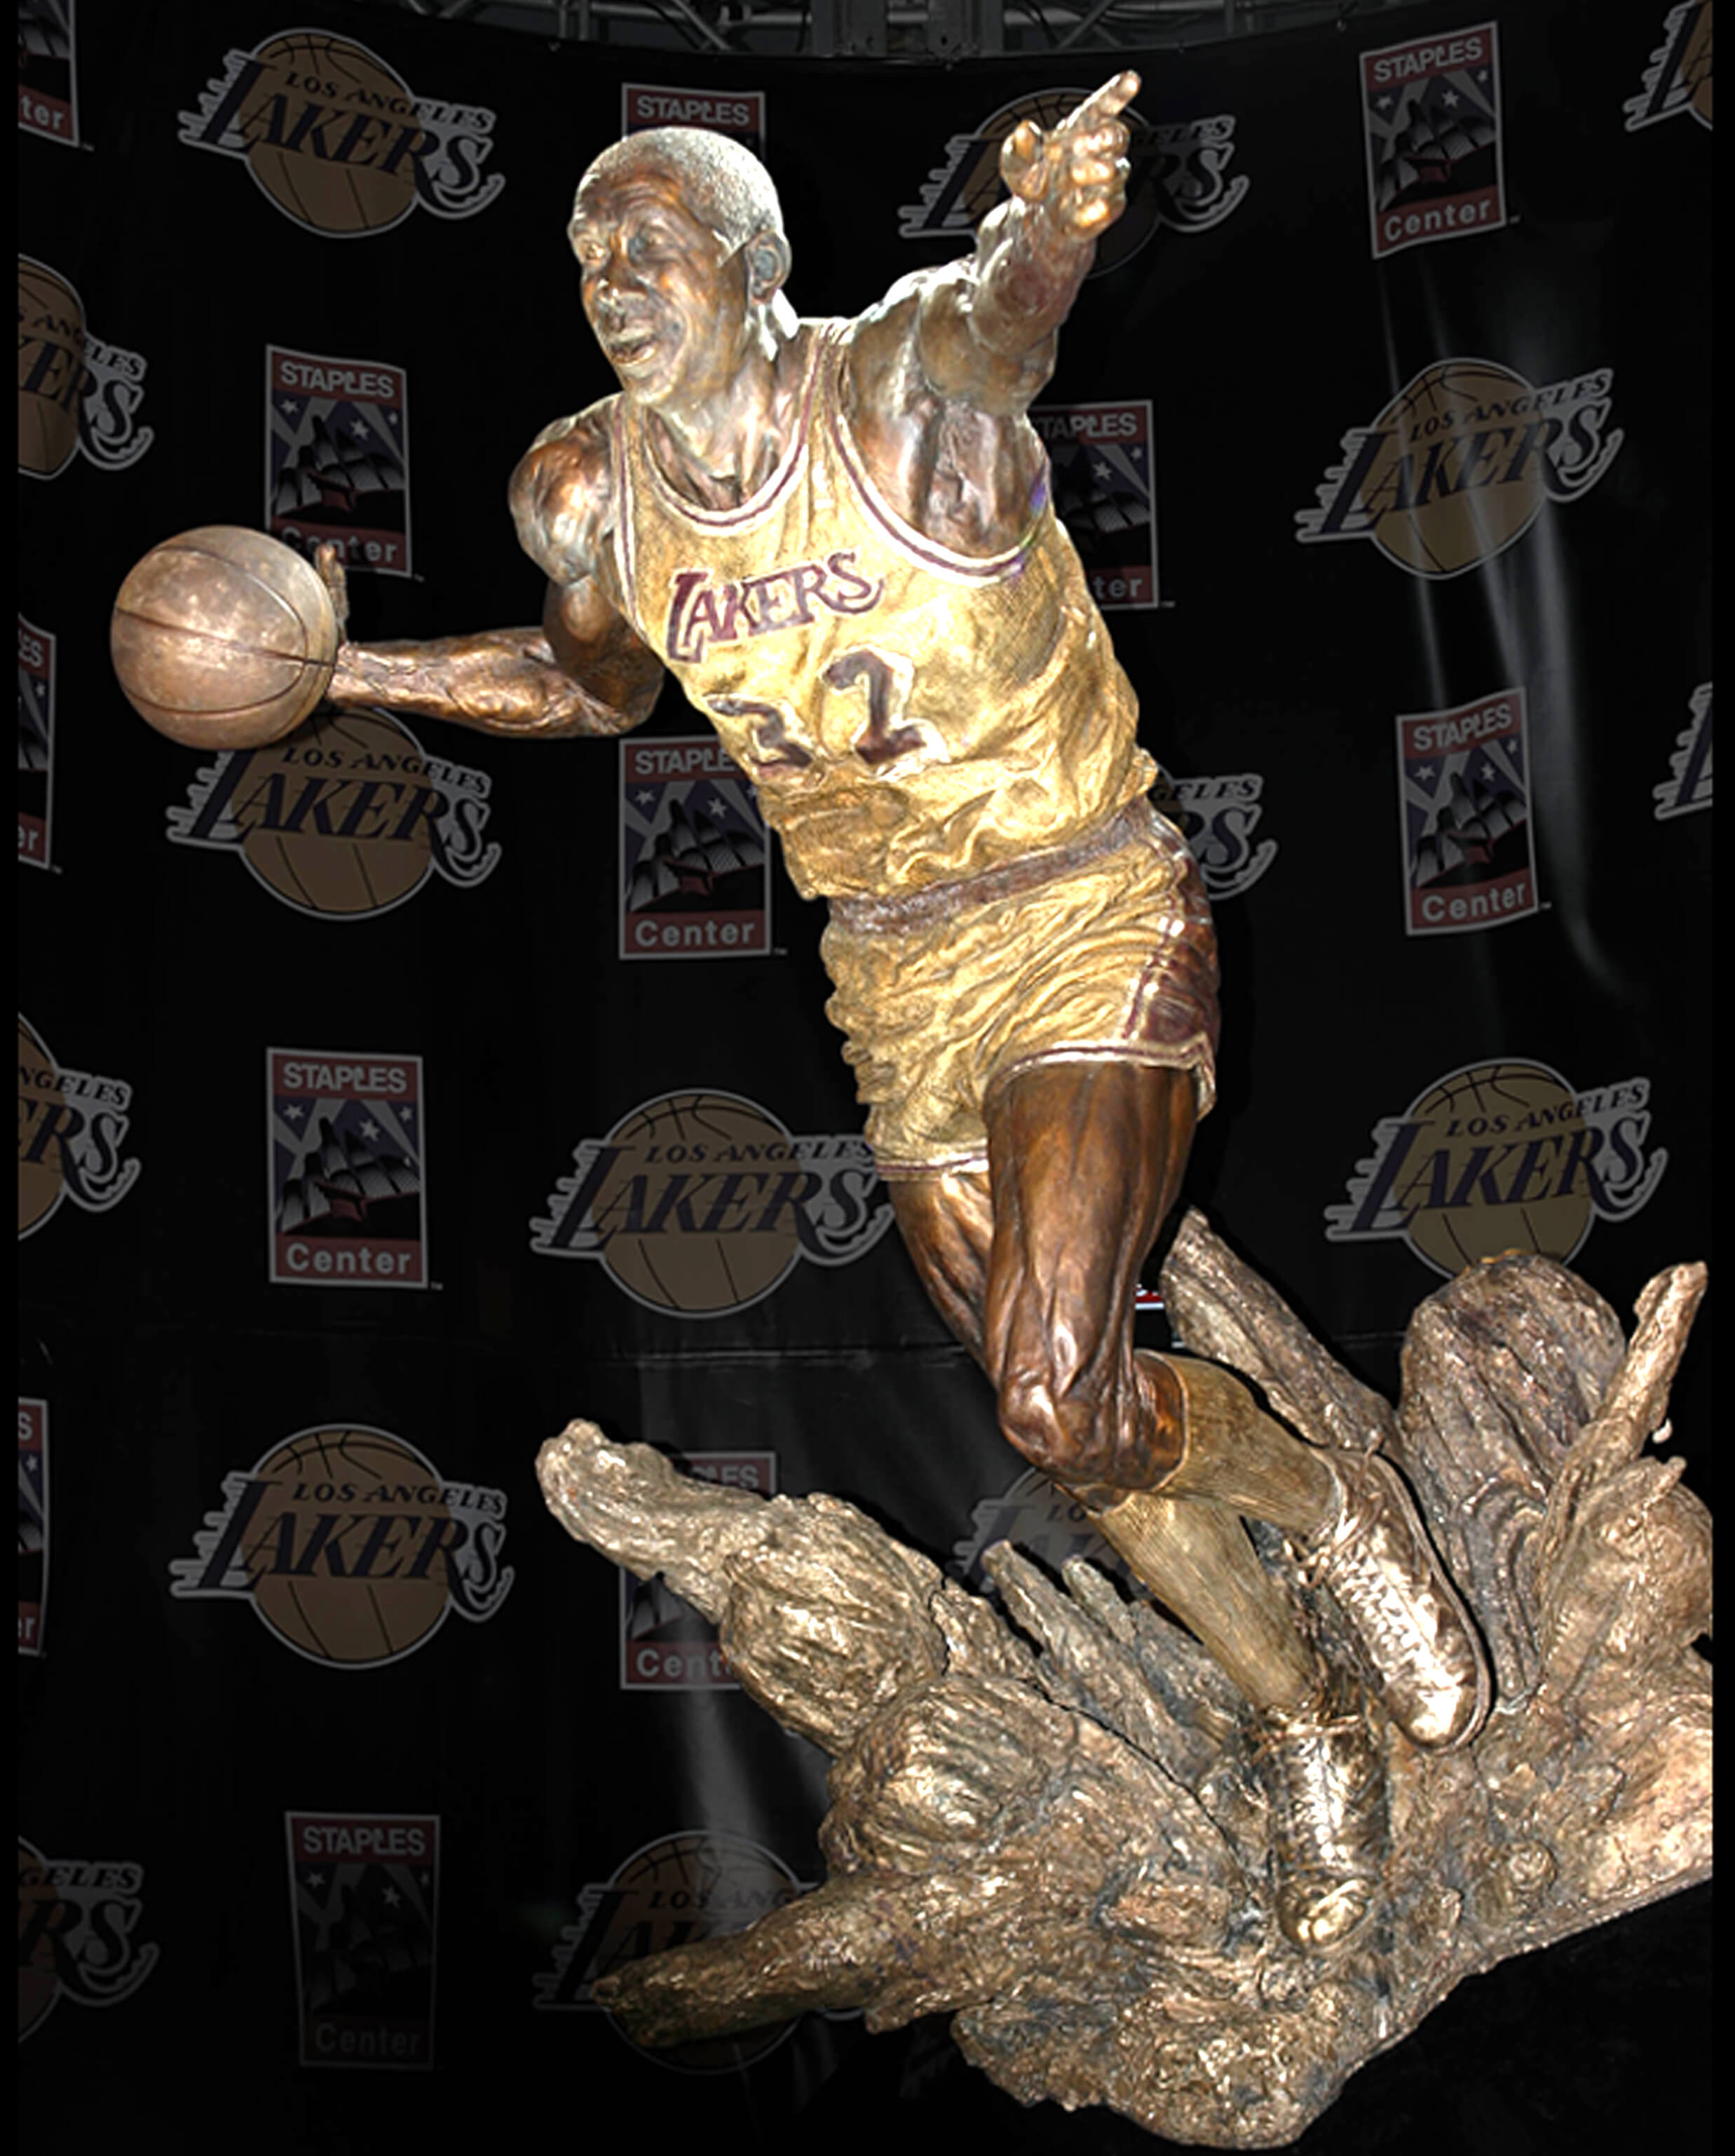 Magic Johnson, LA Lakers, Staples Center, statue